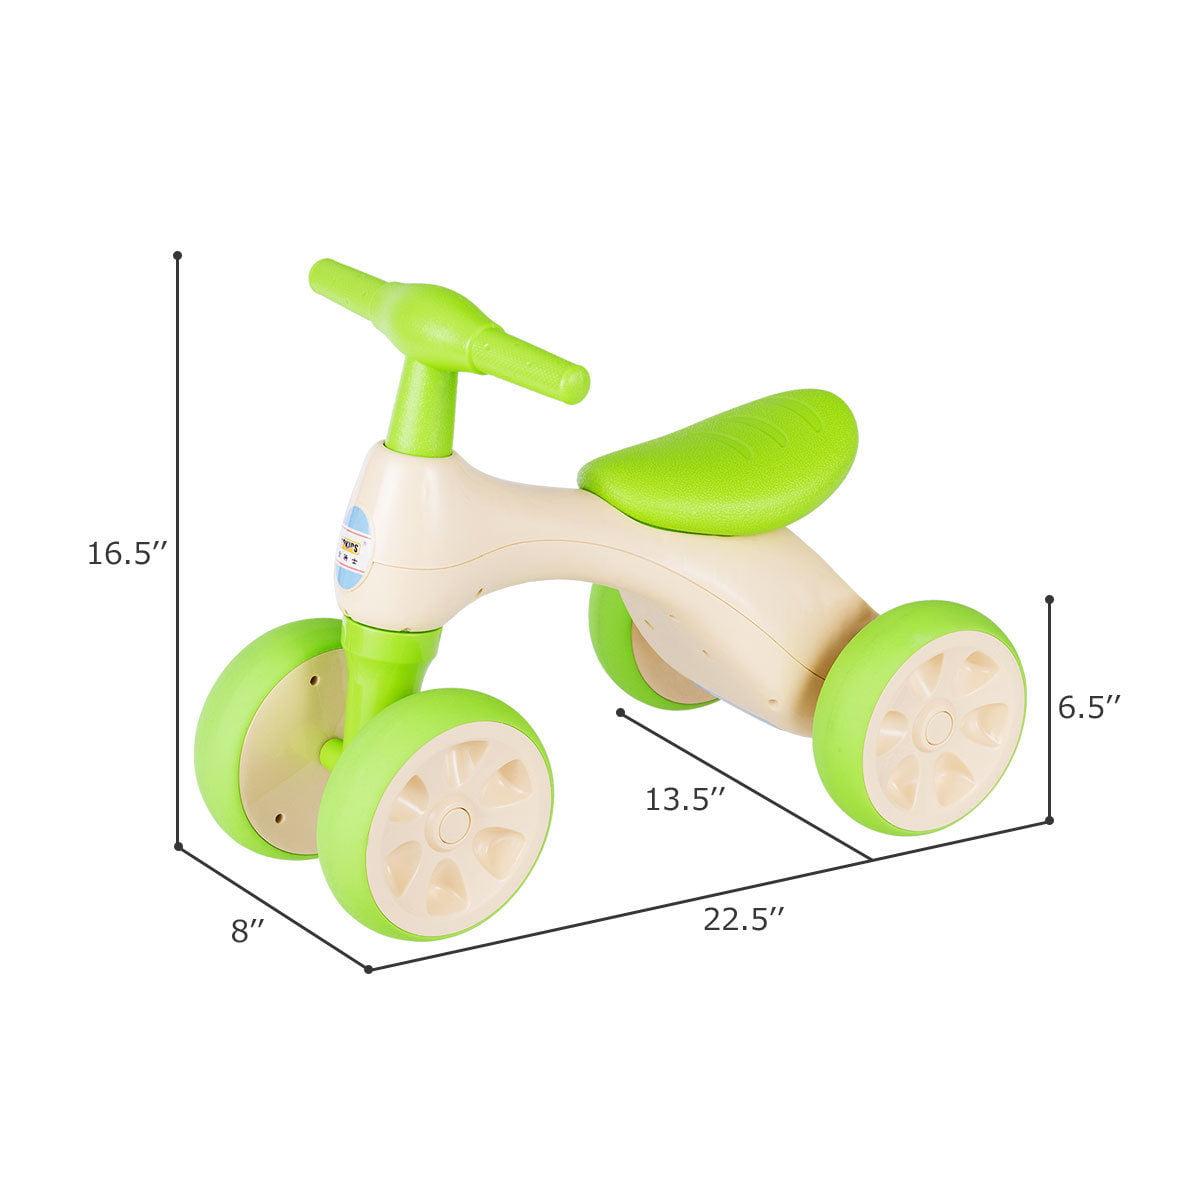 Costway Baby Balance Bike No Pedal Bicycle Children Walker 4 Wheels w/ Sound & Storage - image 4 de 10